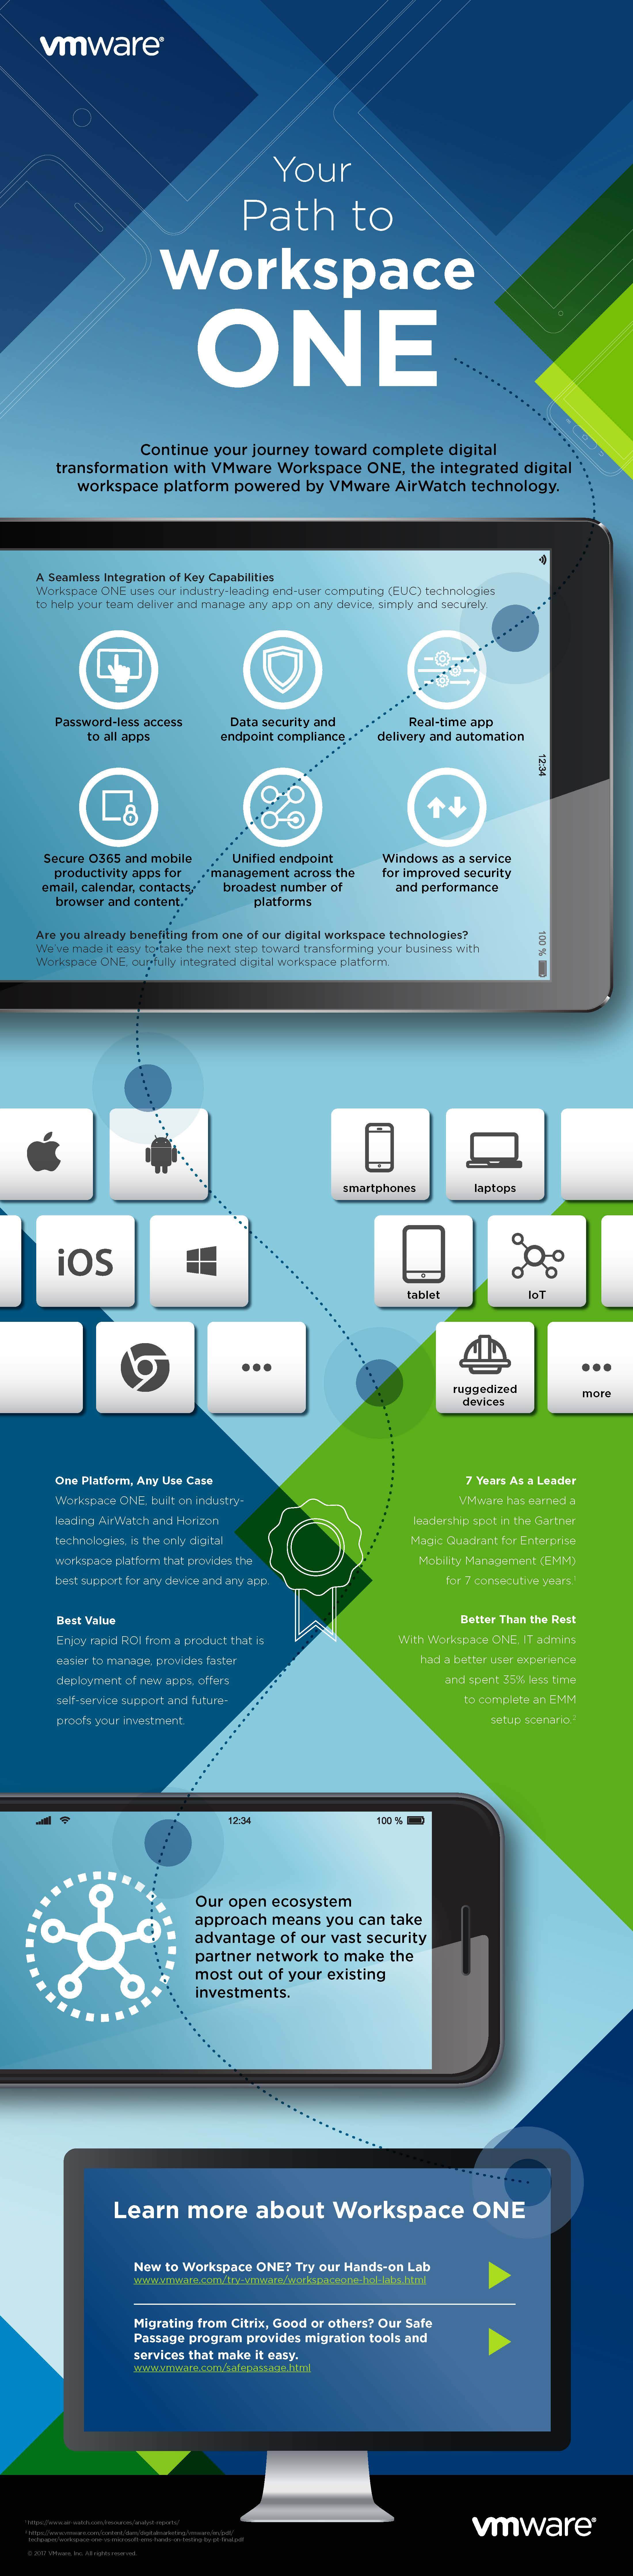 vmware-workspace-one-Infographic